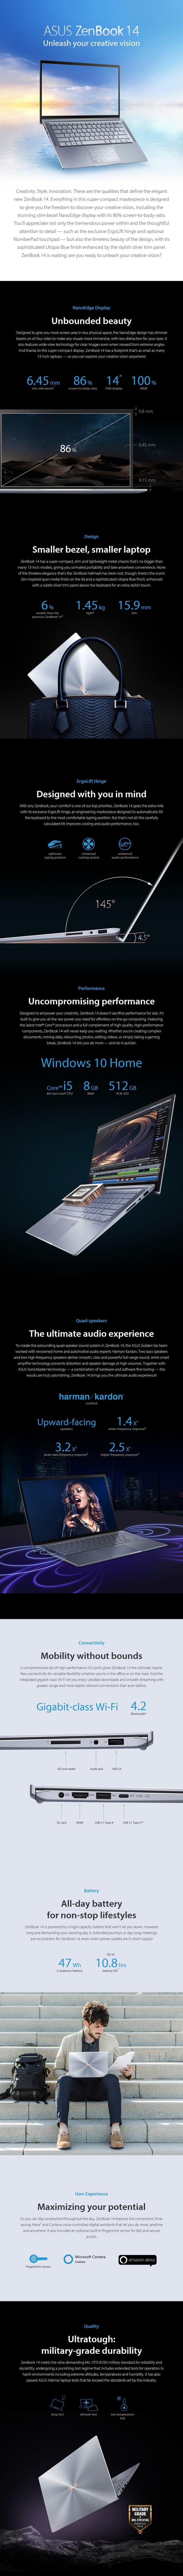 "ASUS ZenBook 14 UX431FA 14"" Laptop i5-8265U 8GB 512GB W10H - Utopia Blue Metal - Overview 1"